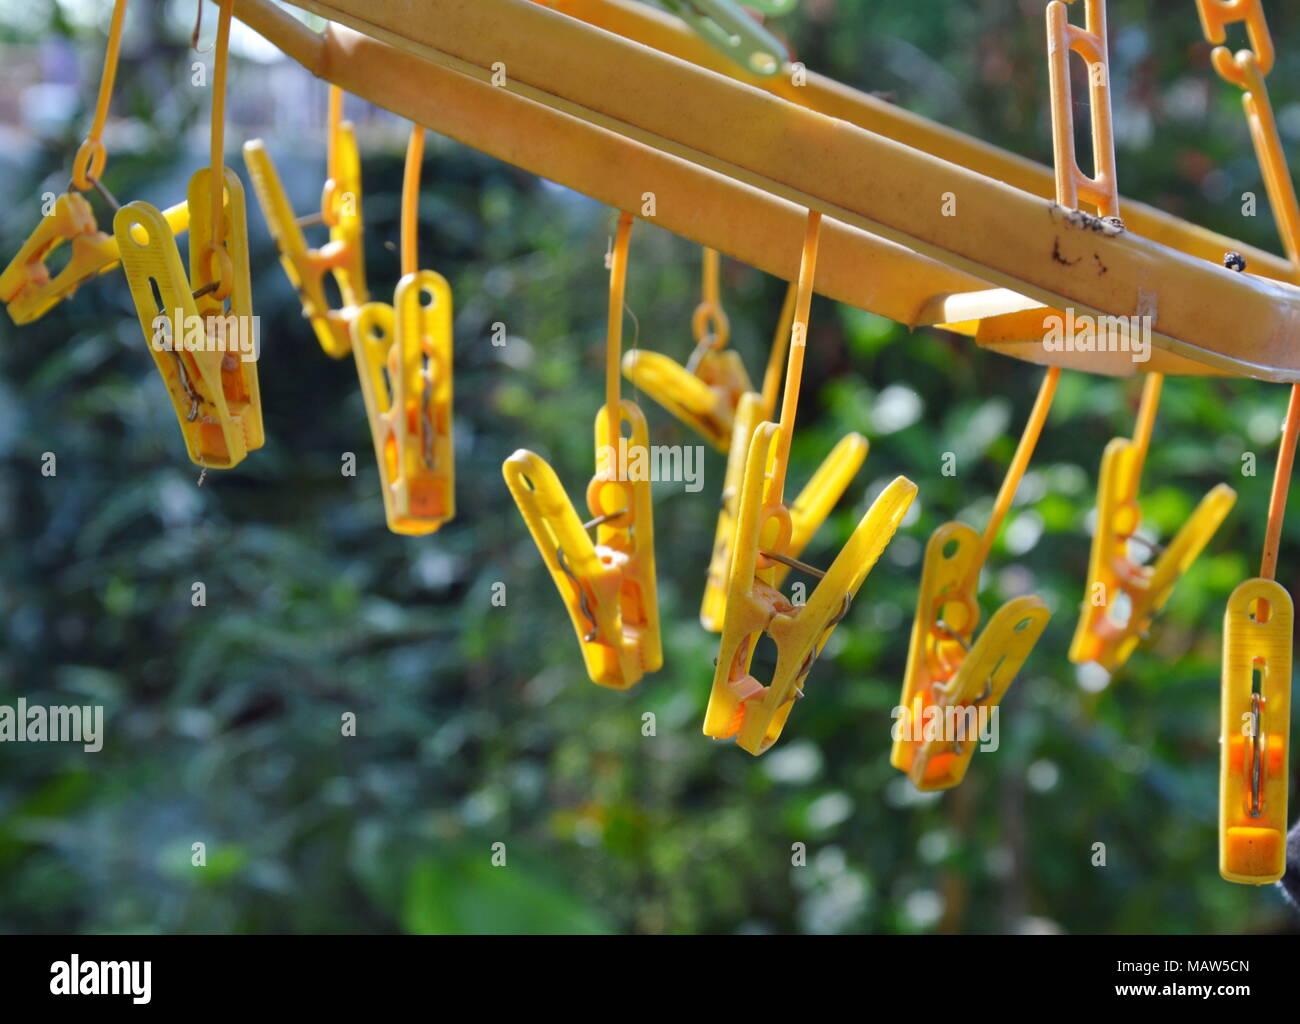 yellow cloth pin hanging in garden Stock Photo